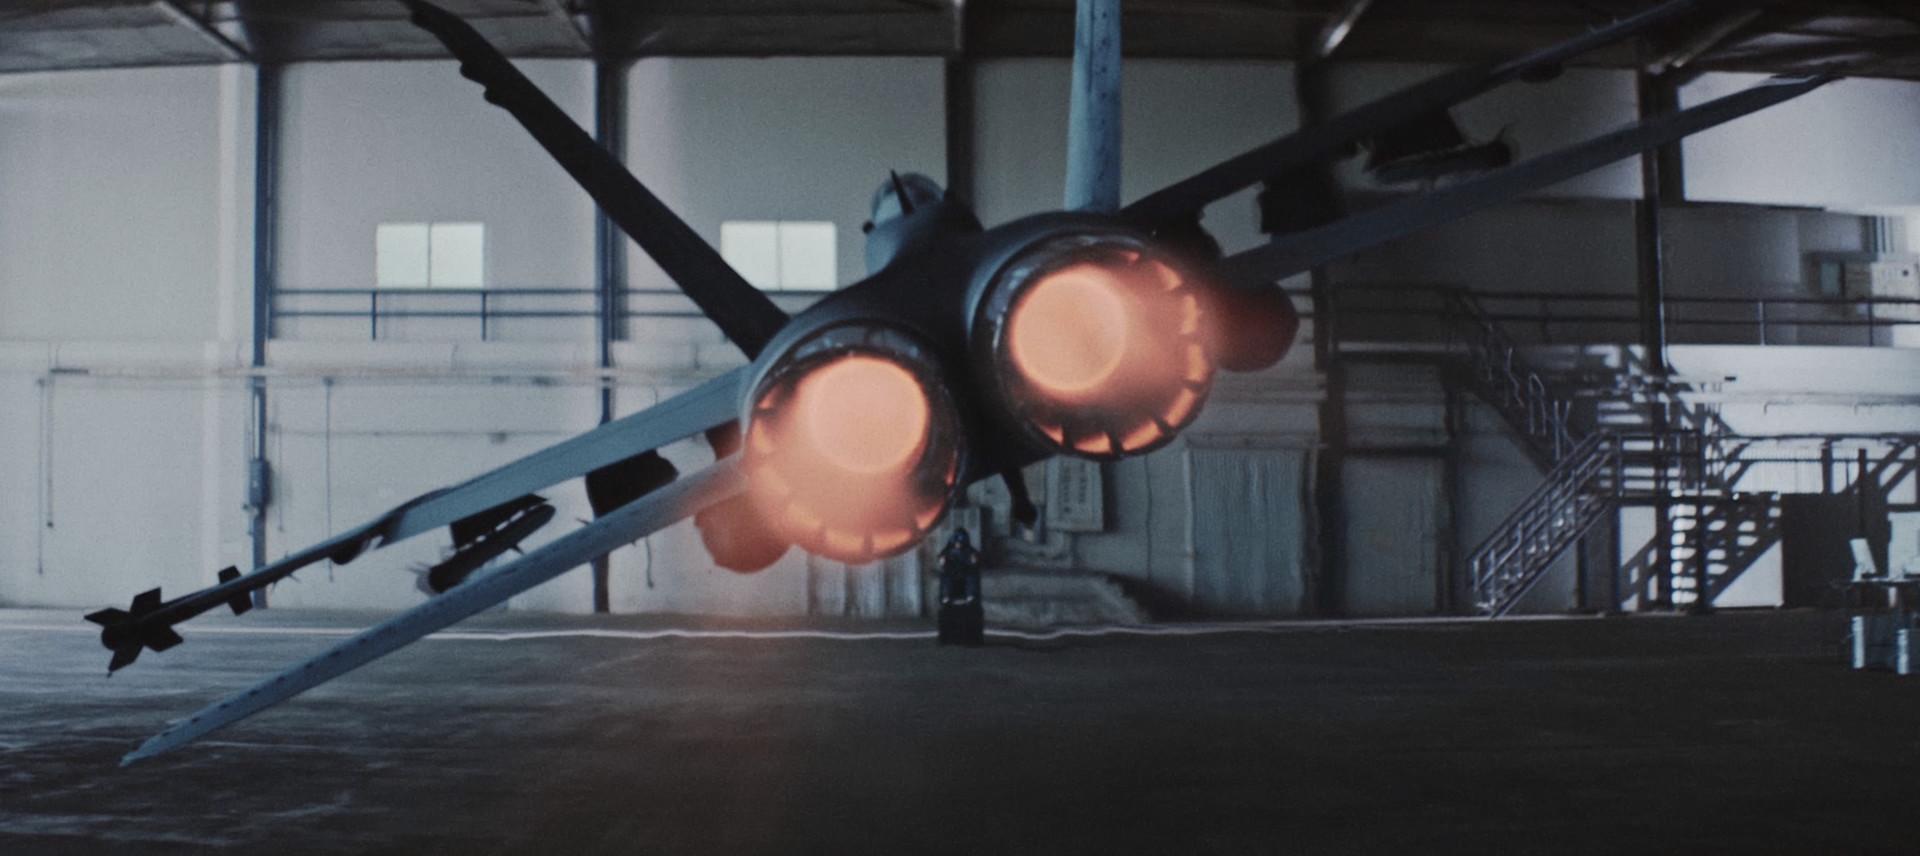 Varjo // Resolution Revolution. Contribution: VR aircraft @1:05-1:17 -- animation, shading/rendering, compositing. Cleanup: Arttu Rautio. Flame sim & render: Tuomo Kujala. Grade: Joni Kuusisto. Full credits on Vimeo: https://vimeo.com/245052714.